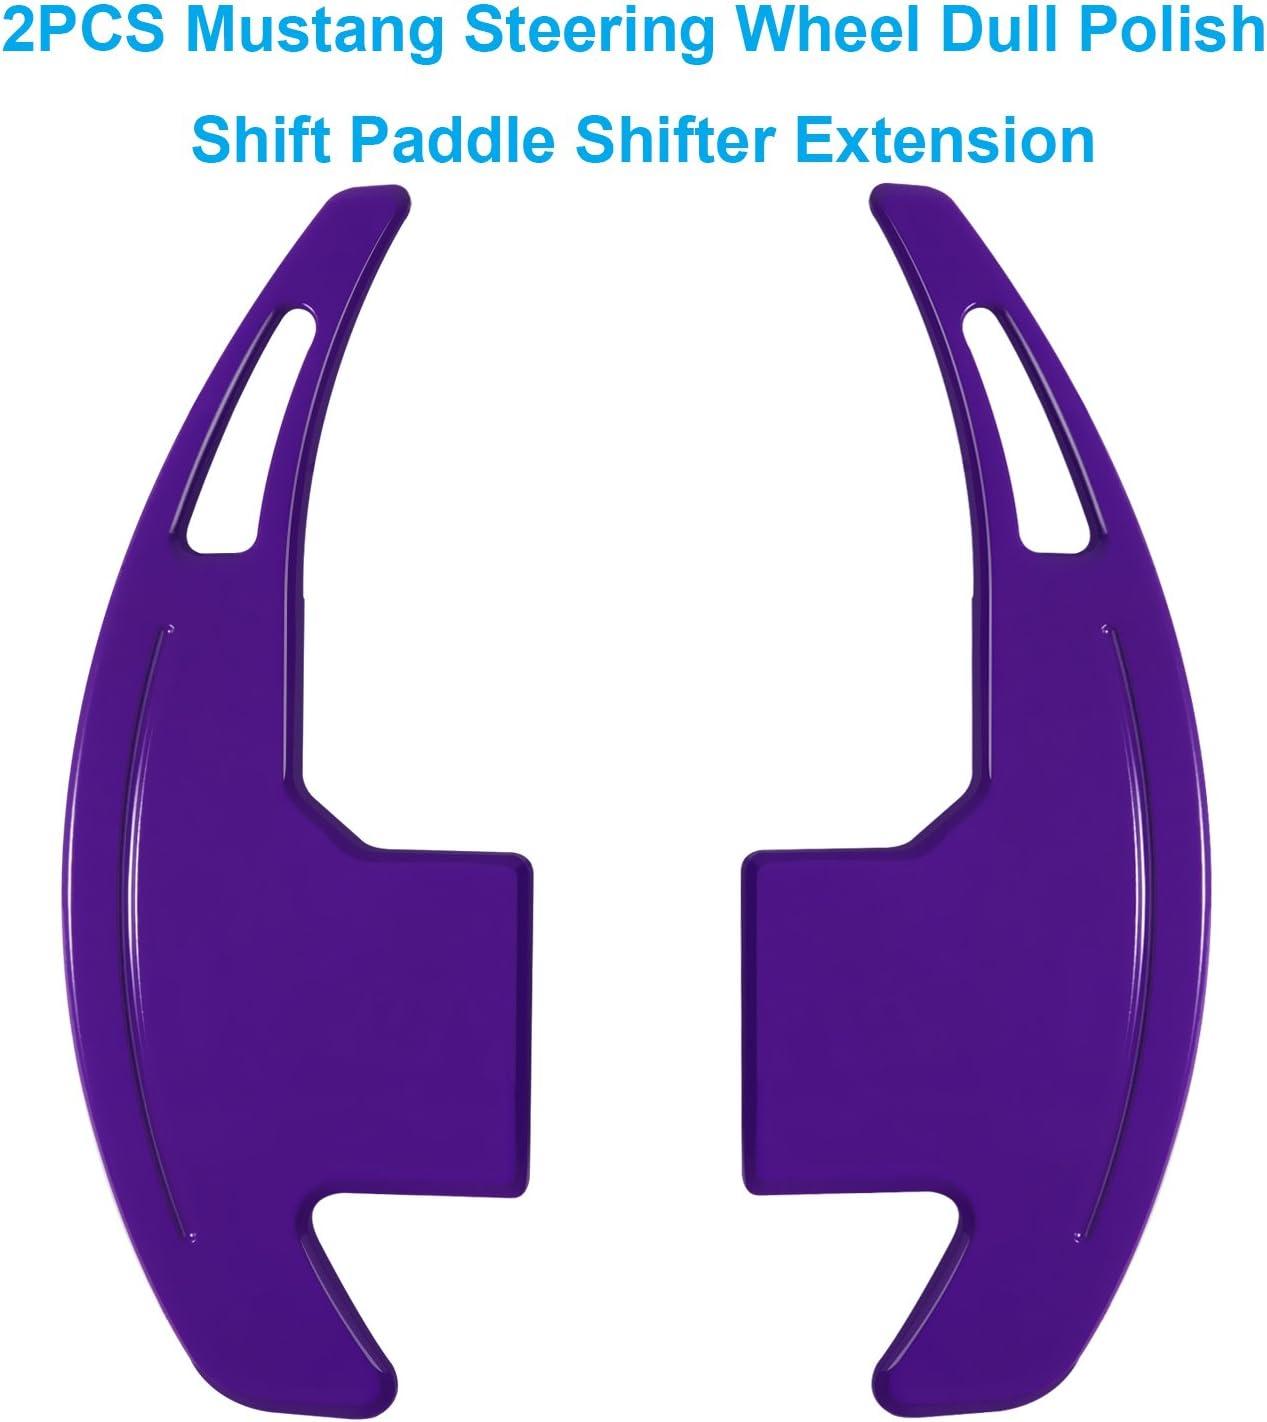 Purple Danti 2Pcs Aluminum Steering Wheel Dull Polish Shift Paddle Shifter Extension for Ford Mustang 2015 2016 2017 2018